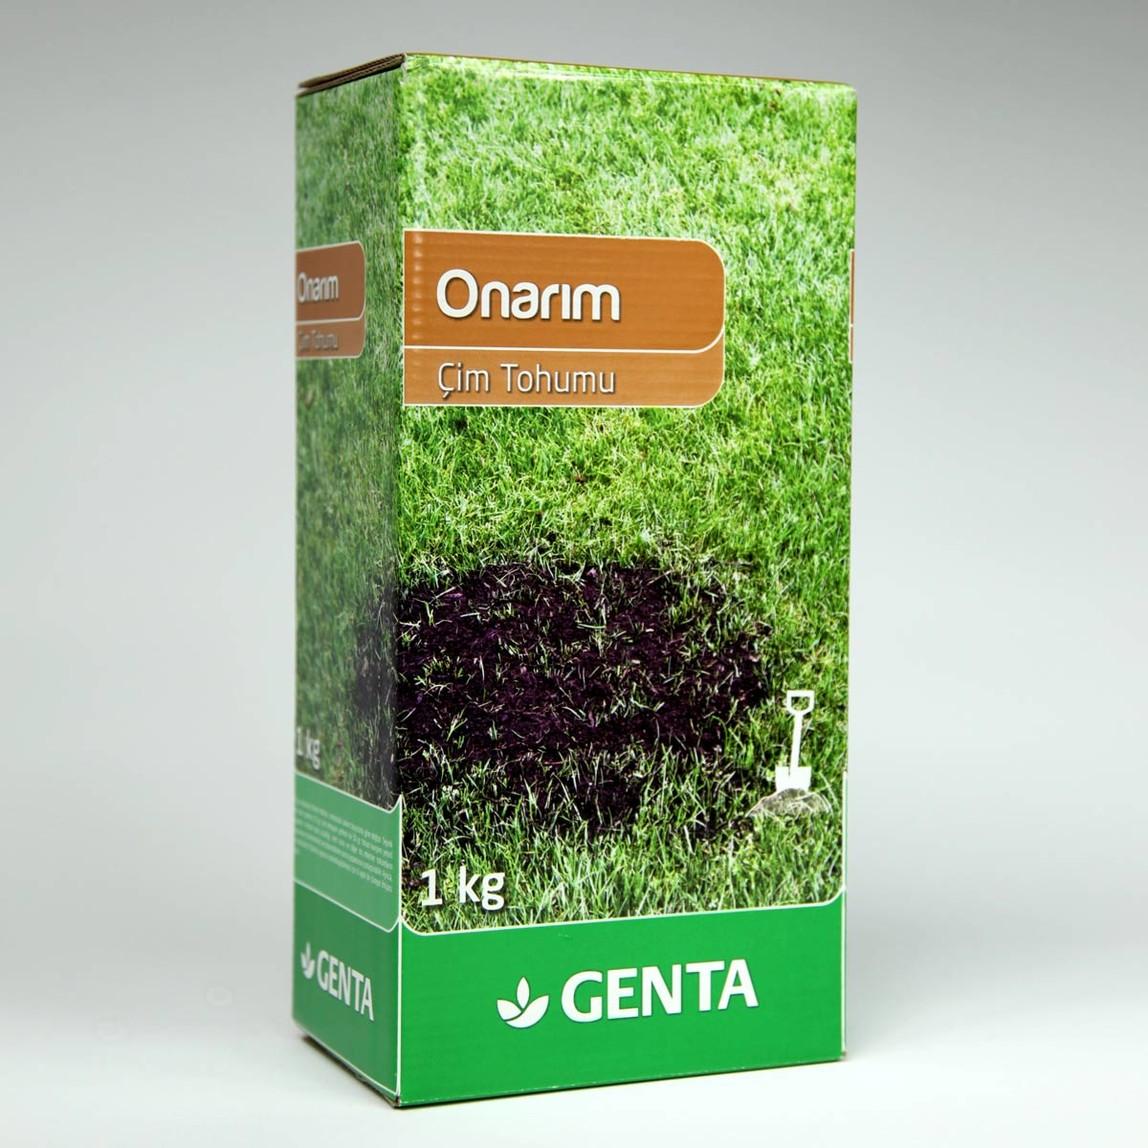 Genta Onarım Çim Tohumu 1 kg